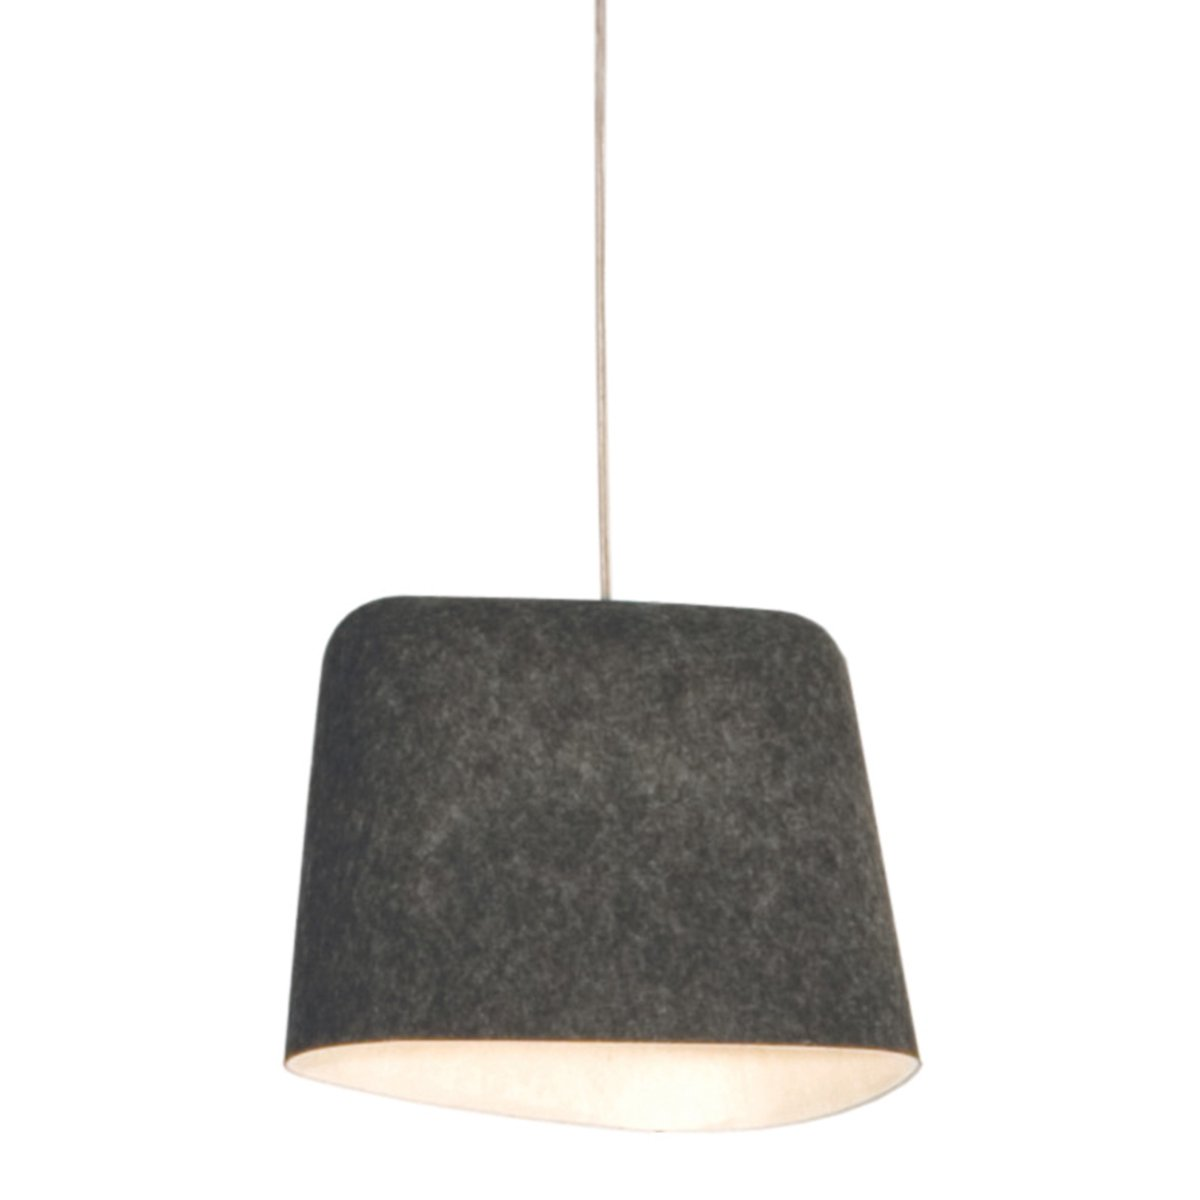 Felt Shade Hanglamp - Tom Dixon